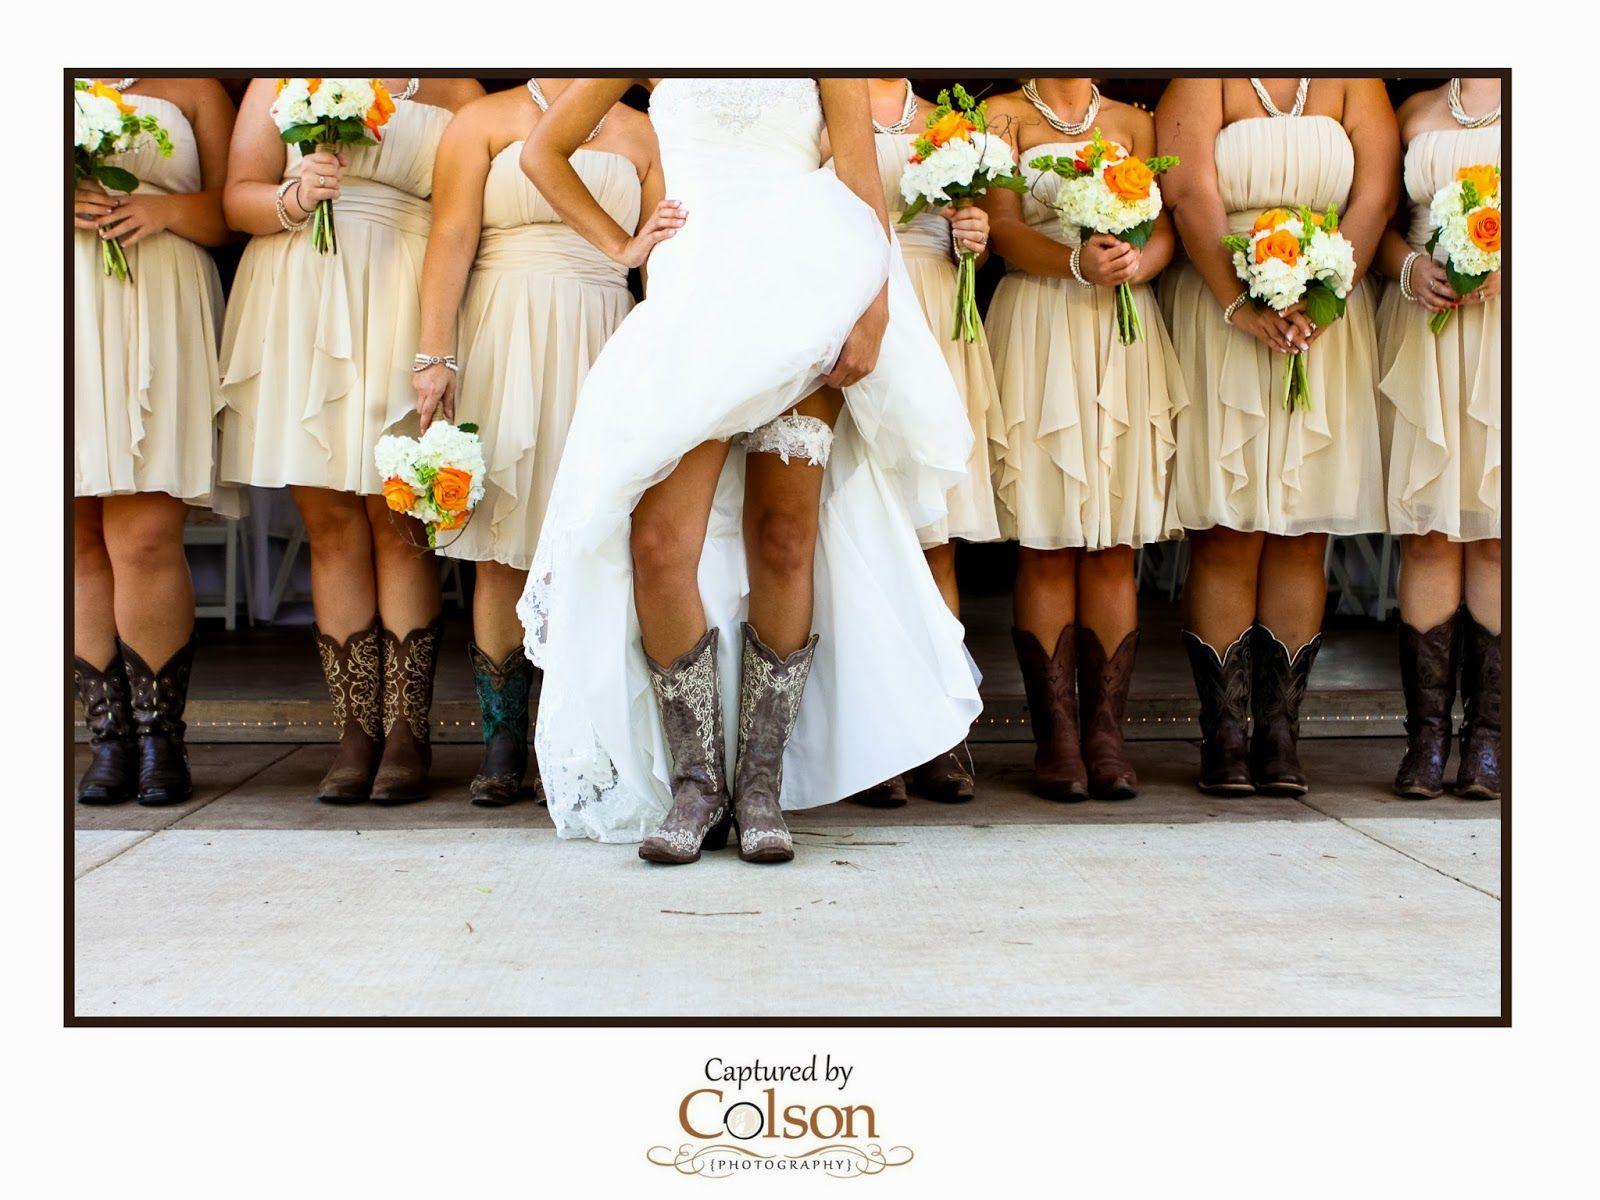 Lujweddingag wedding ideas pinterest wedding